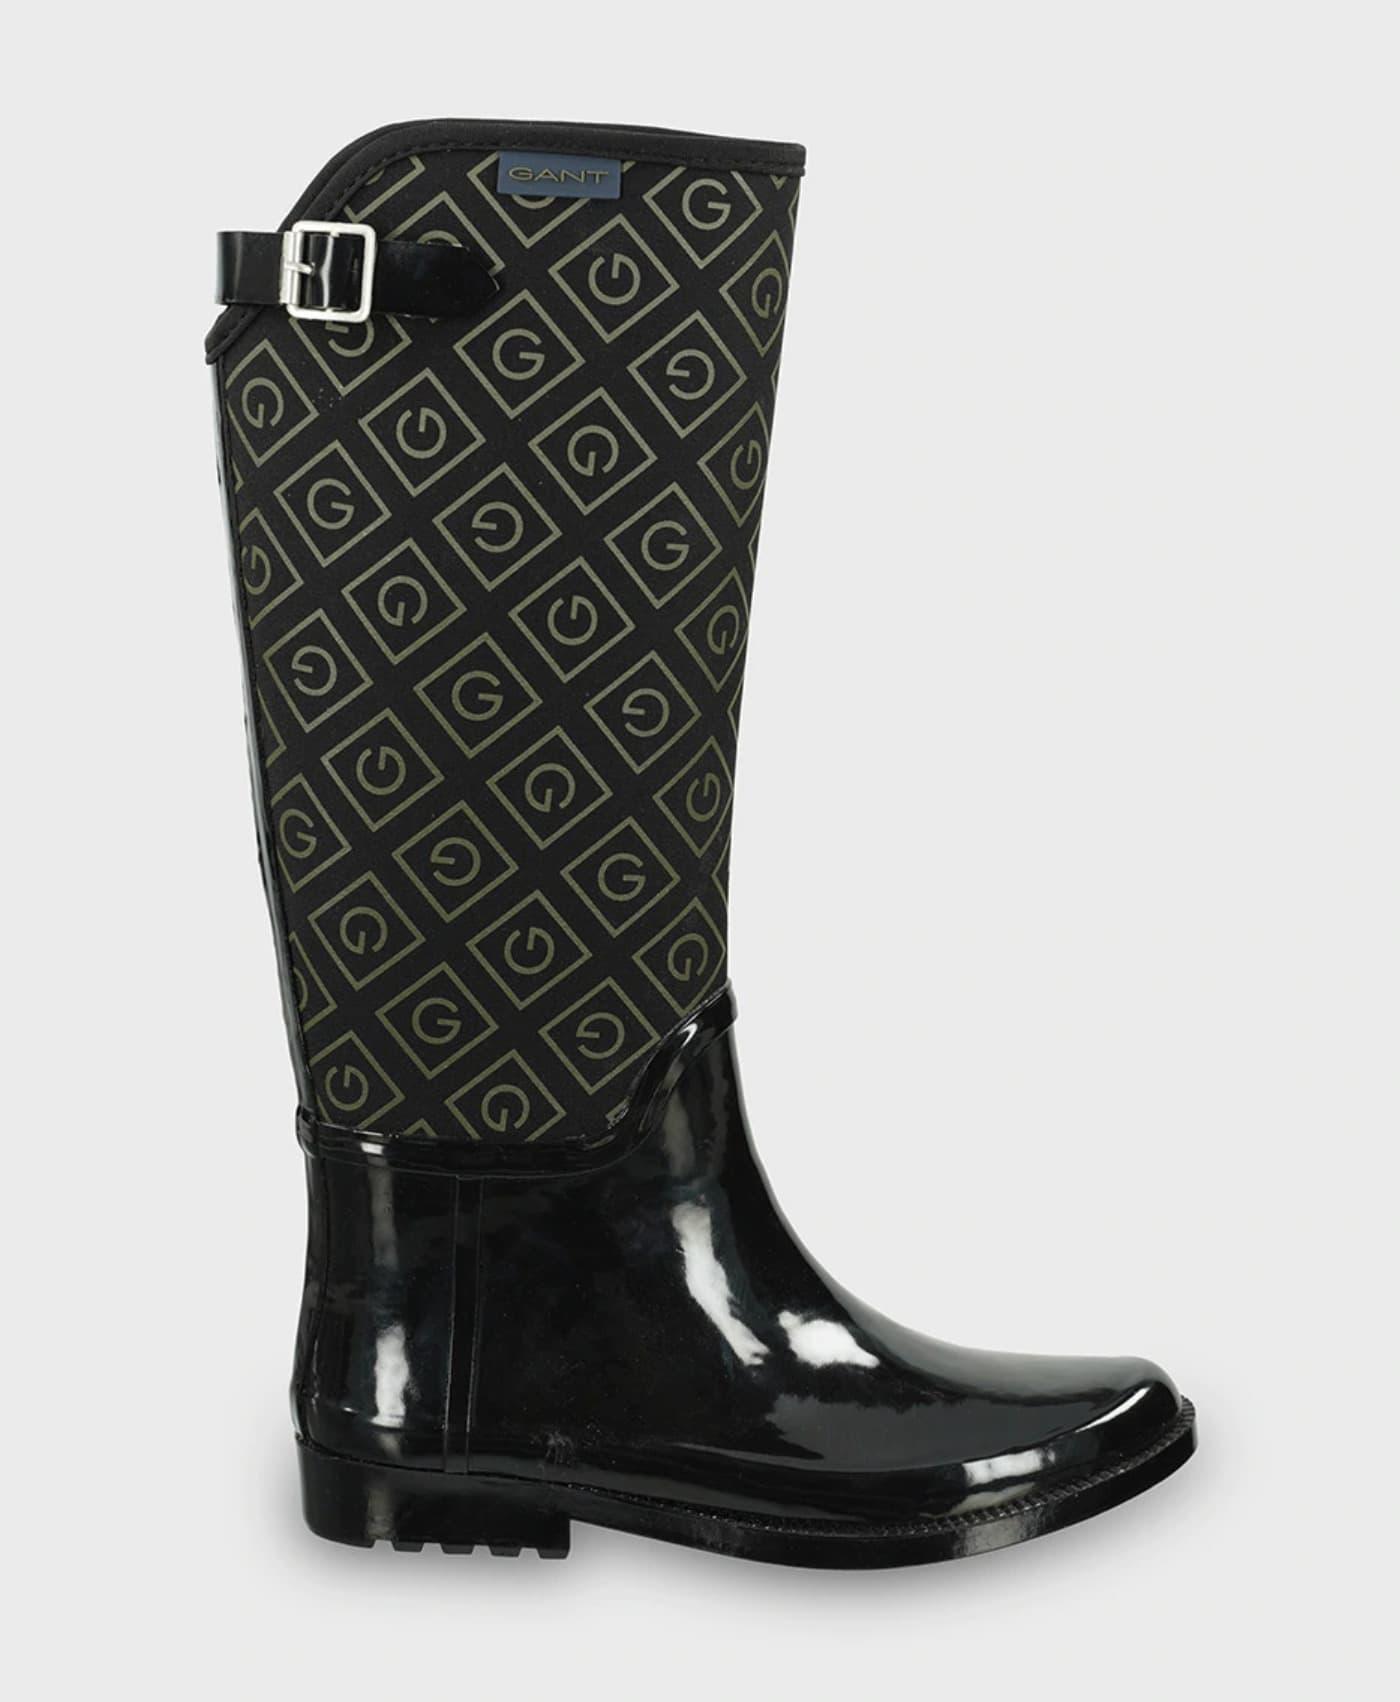 Botas de agua de mujer Gant de color negro